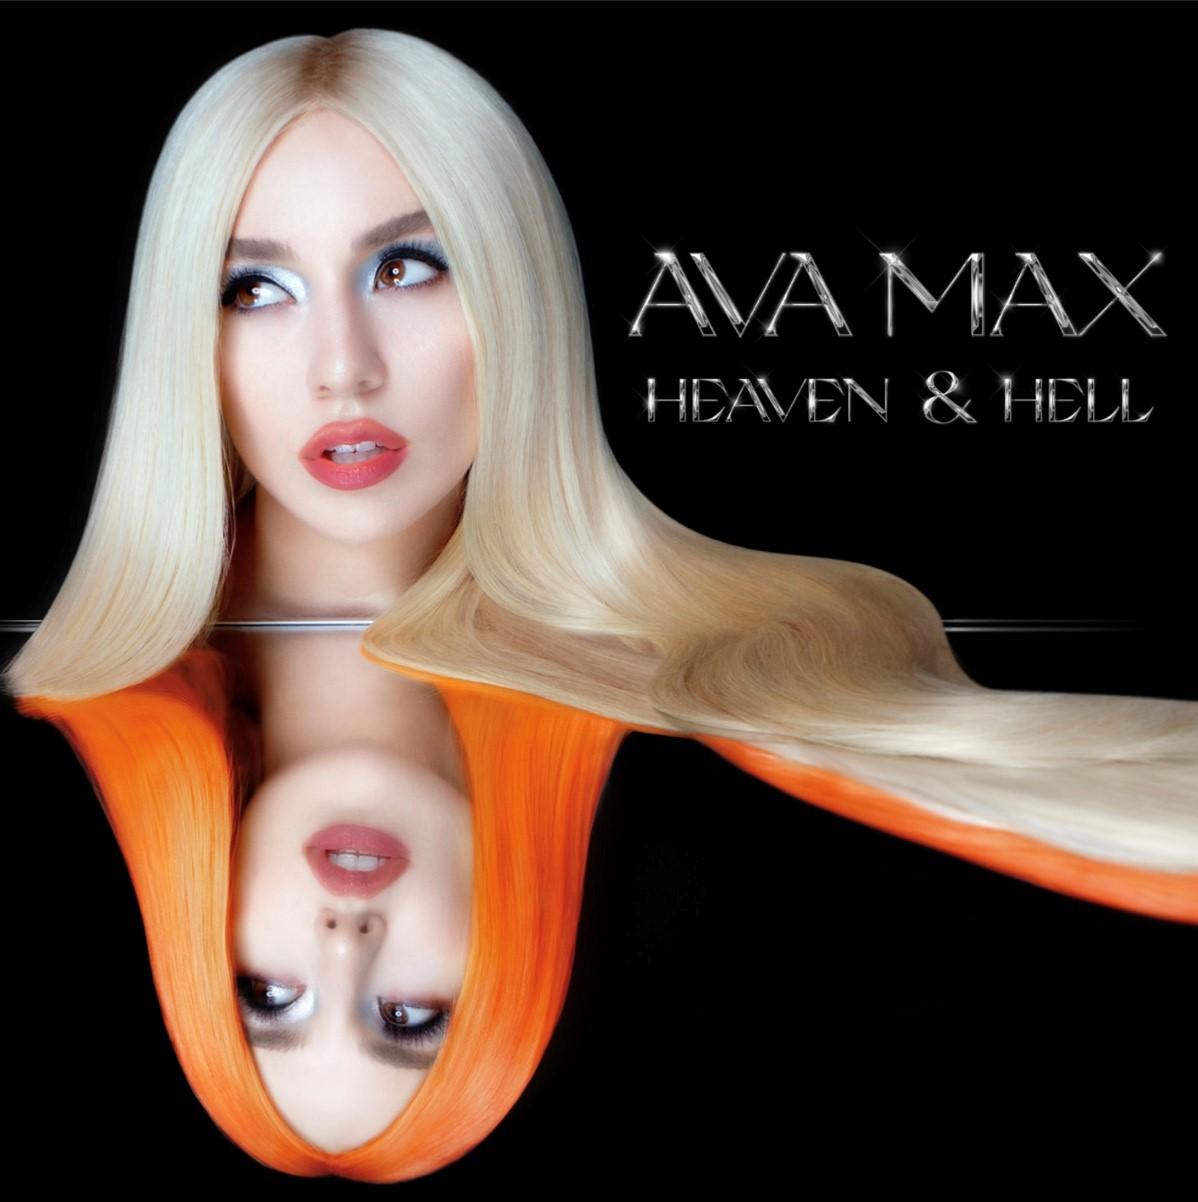 CD Shop - MAX, AVA HEAVEN & HELL